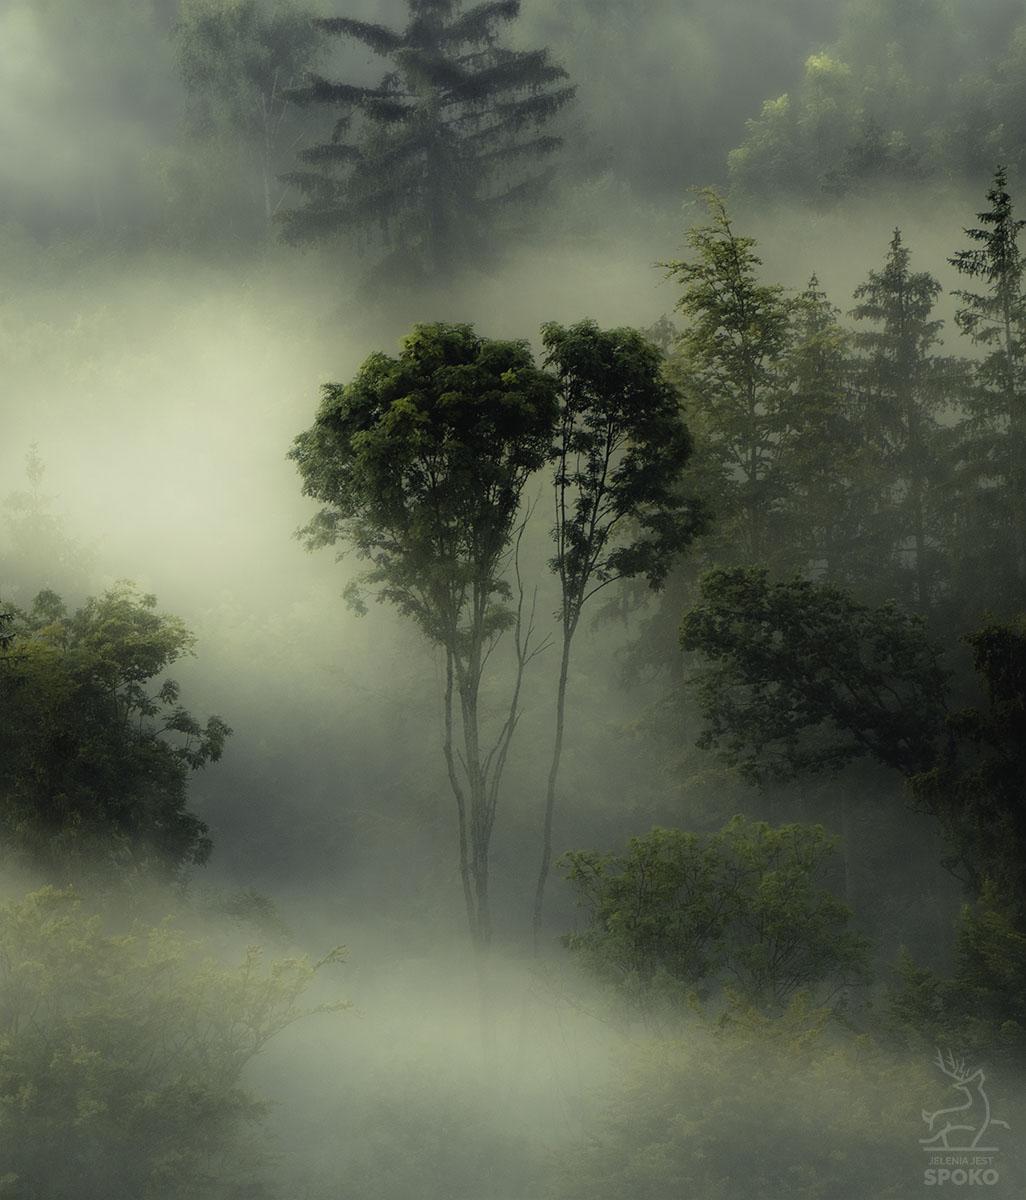 Brokuł we mgle